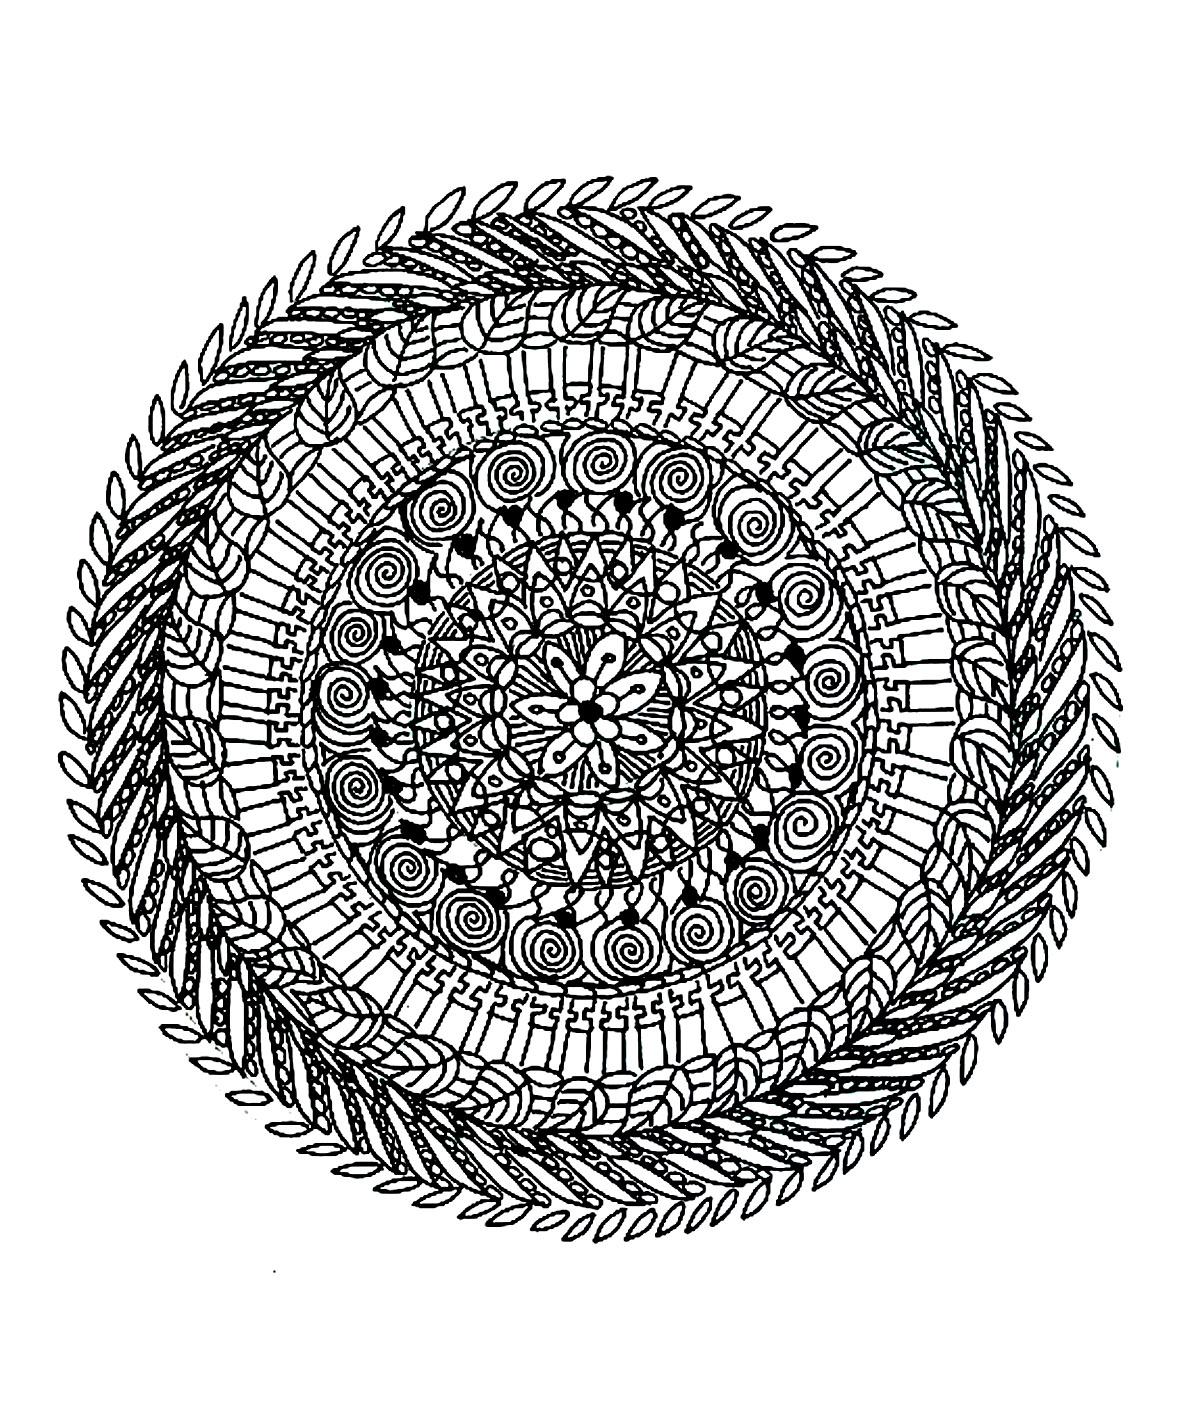 Free Mandala For To Print 2 Mandalas Adult Coloring Pages